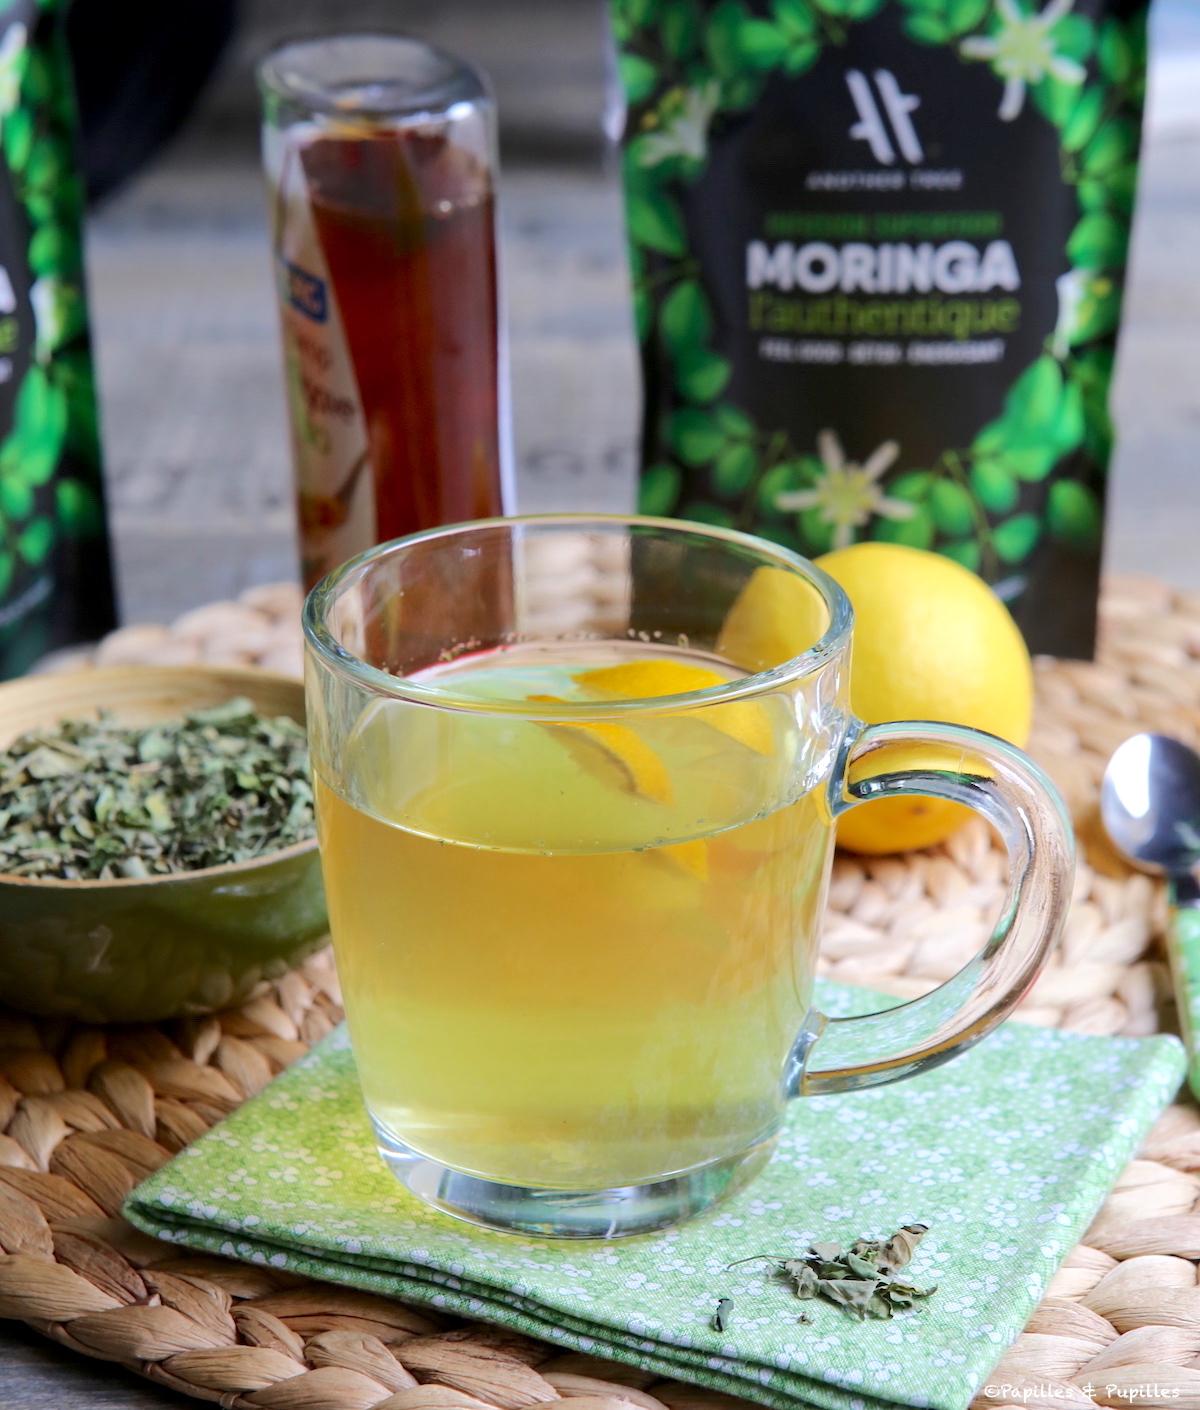 Tisane Moringa gingembre sirop d'agave citron